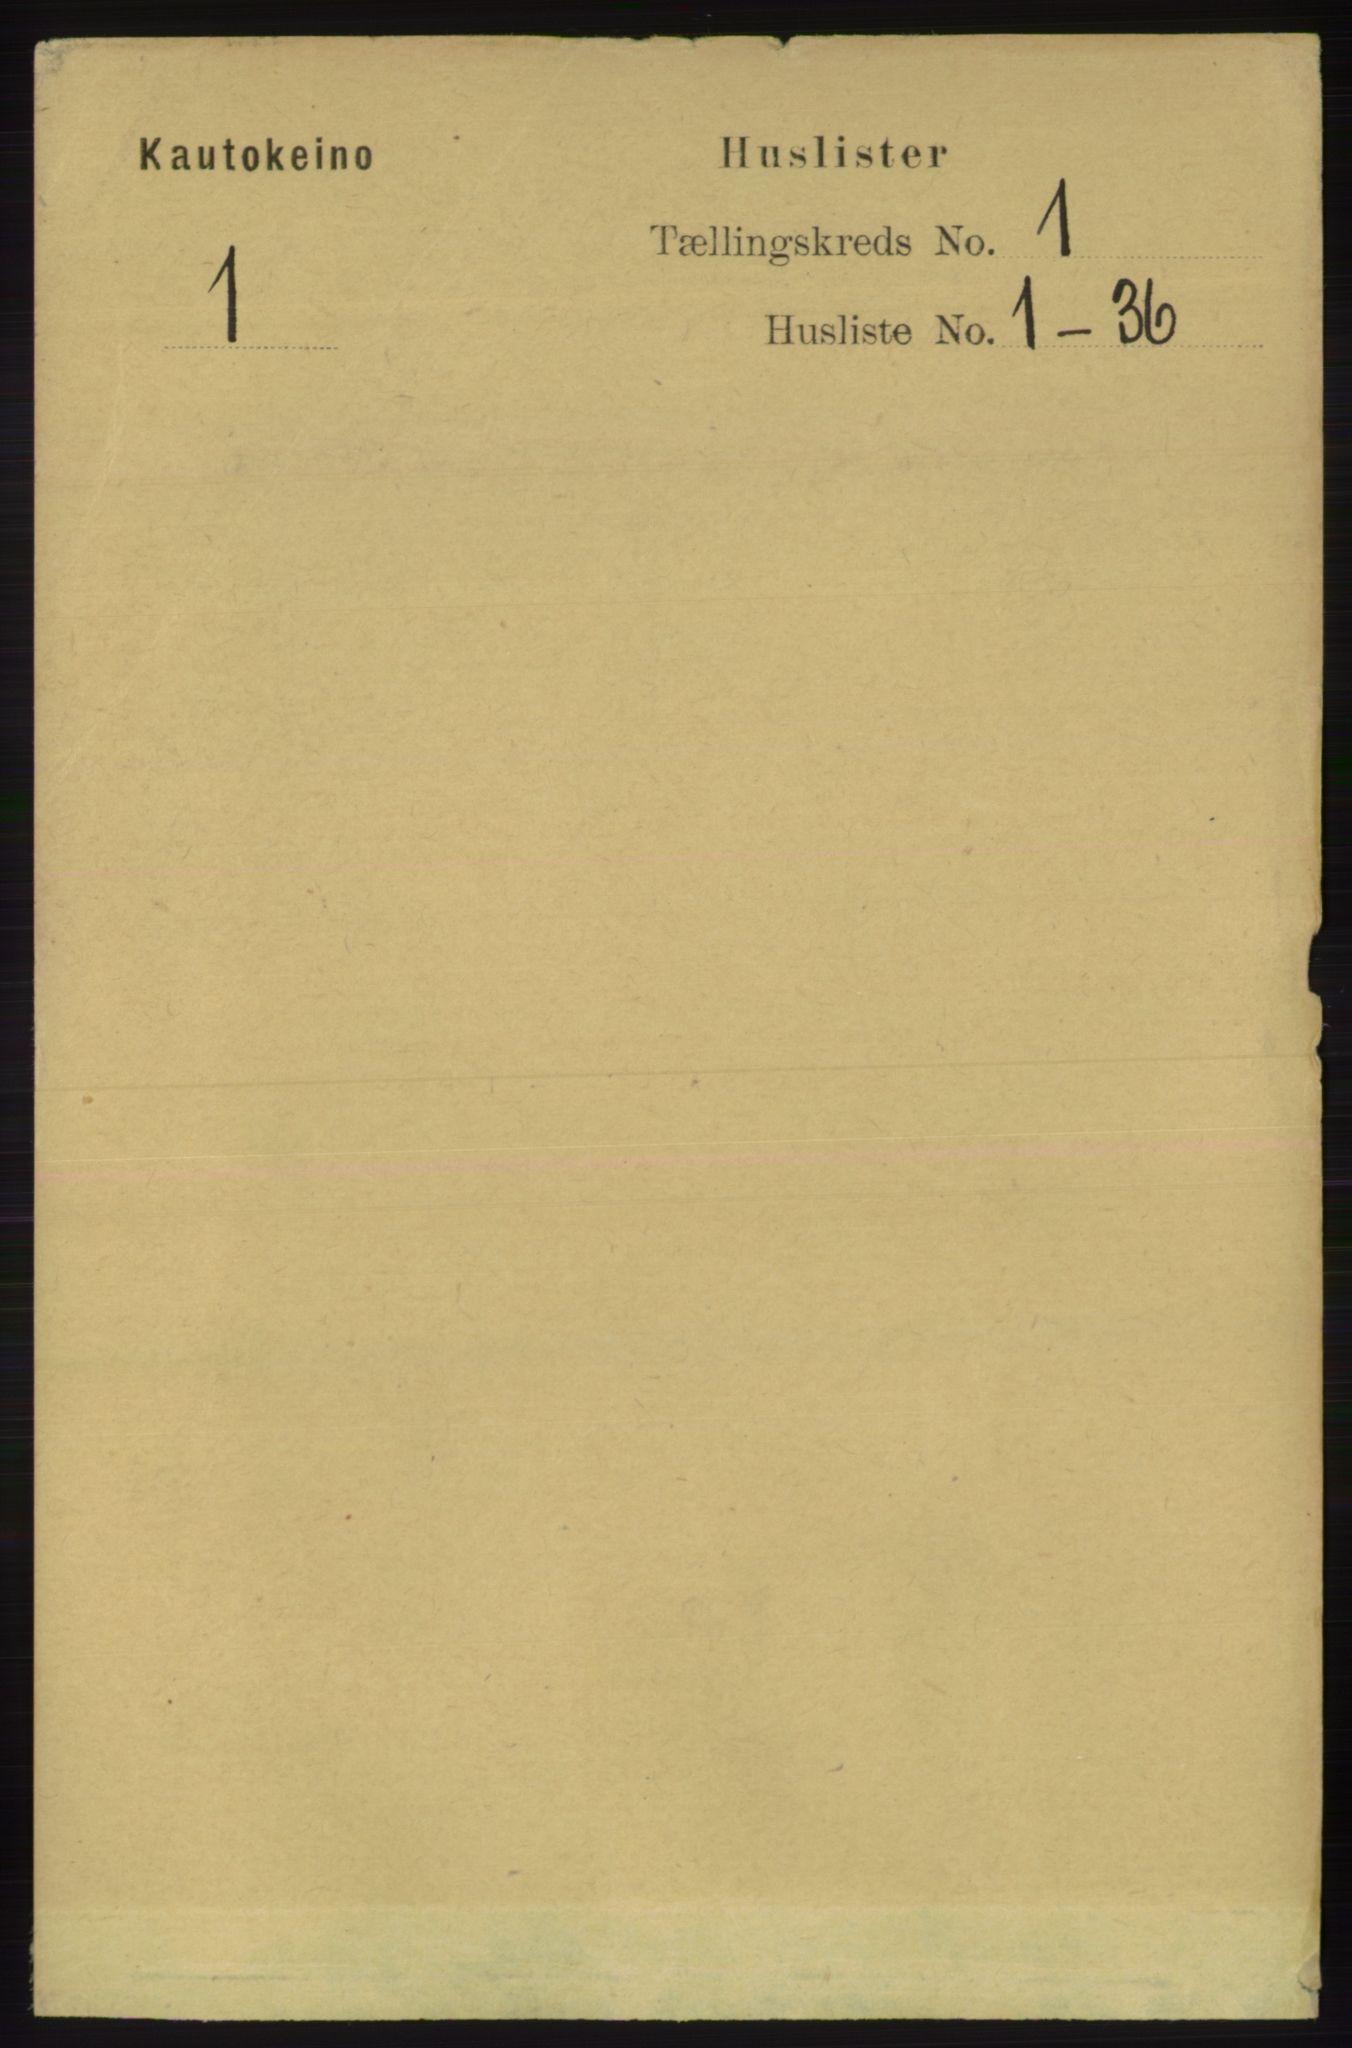 RA, Folketelling 1891 for 2011 Kautokeino herred, 1891, s. 13